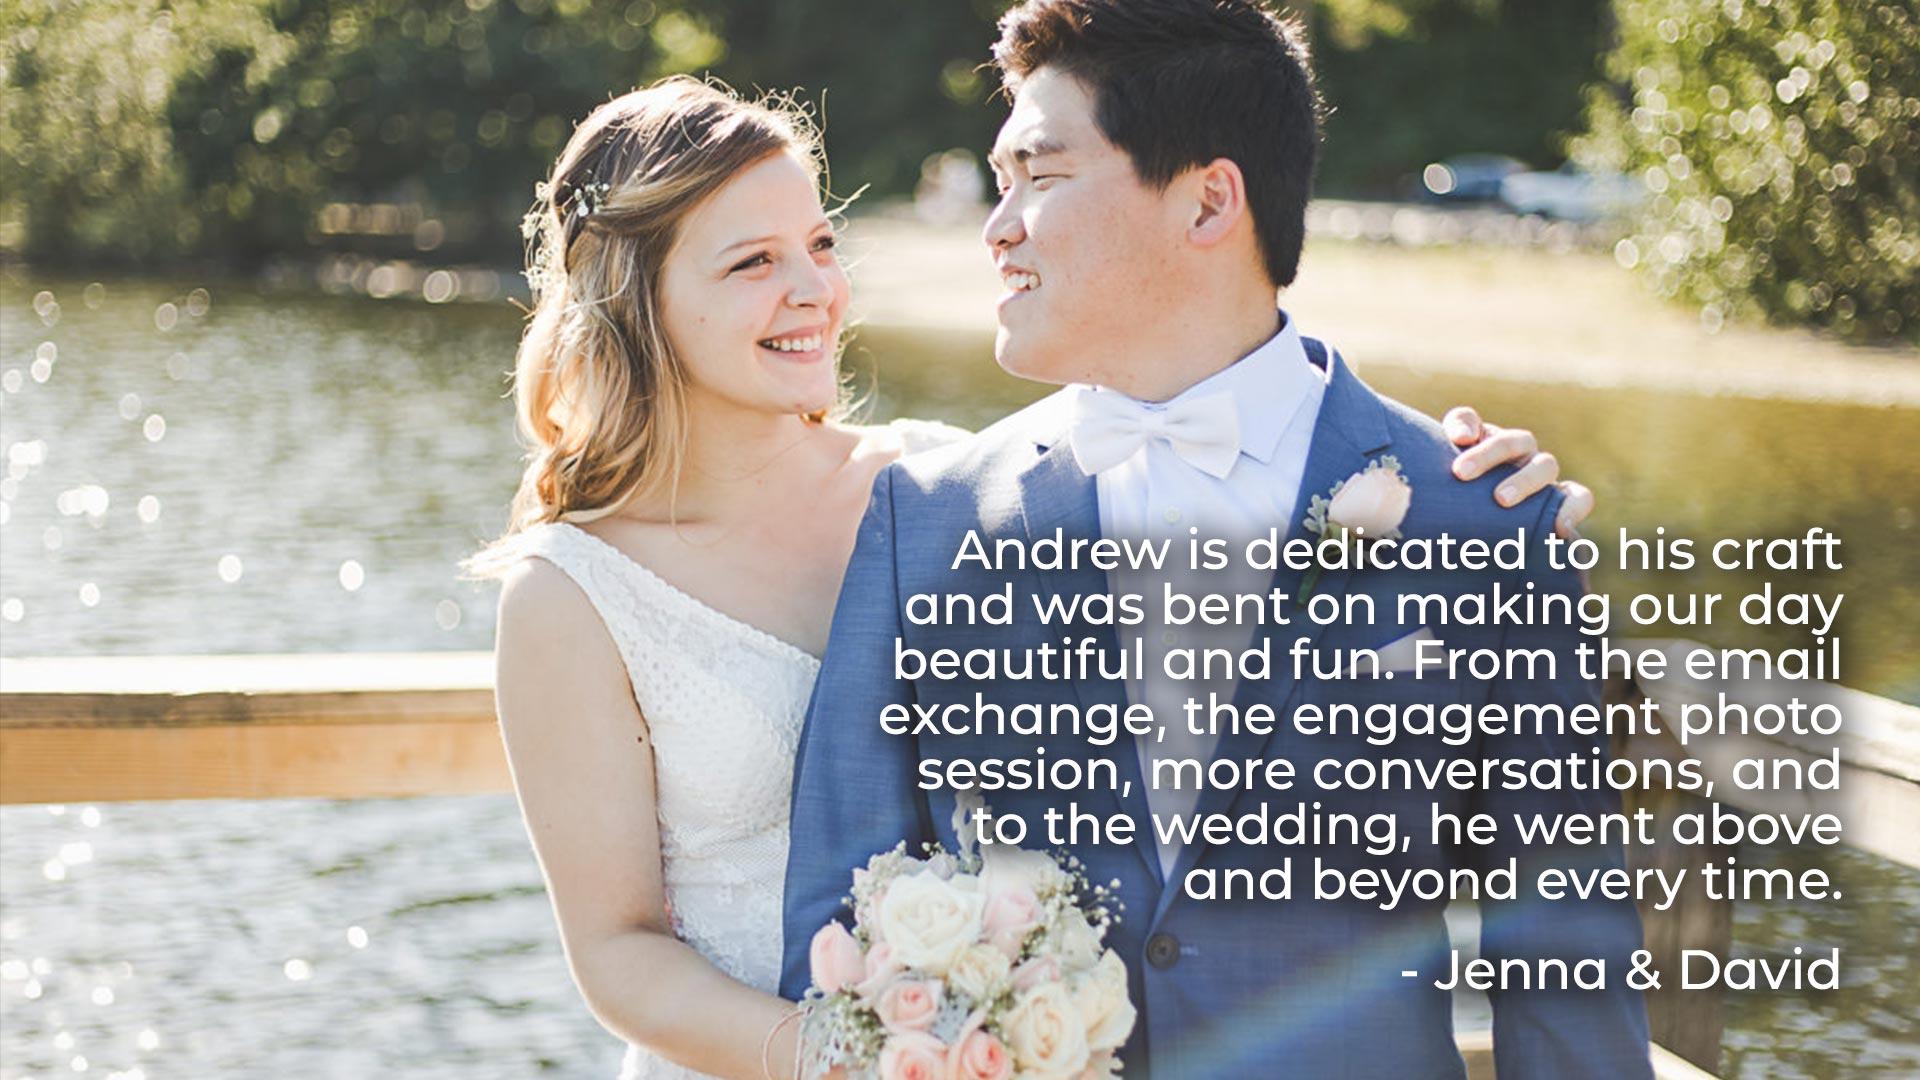 Testimonial from Jenna and David